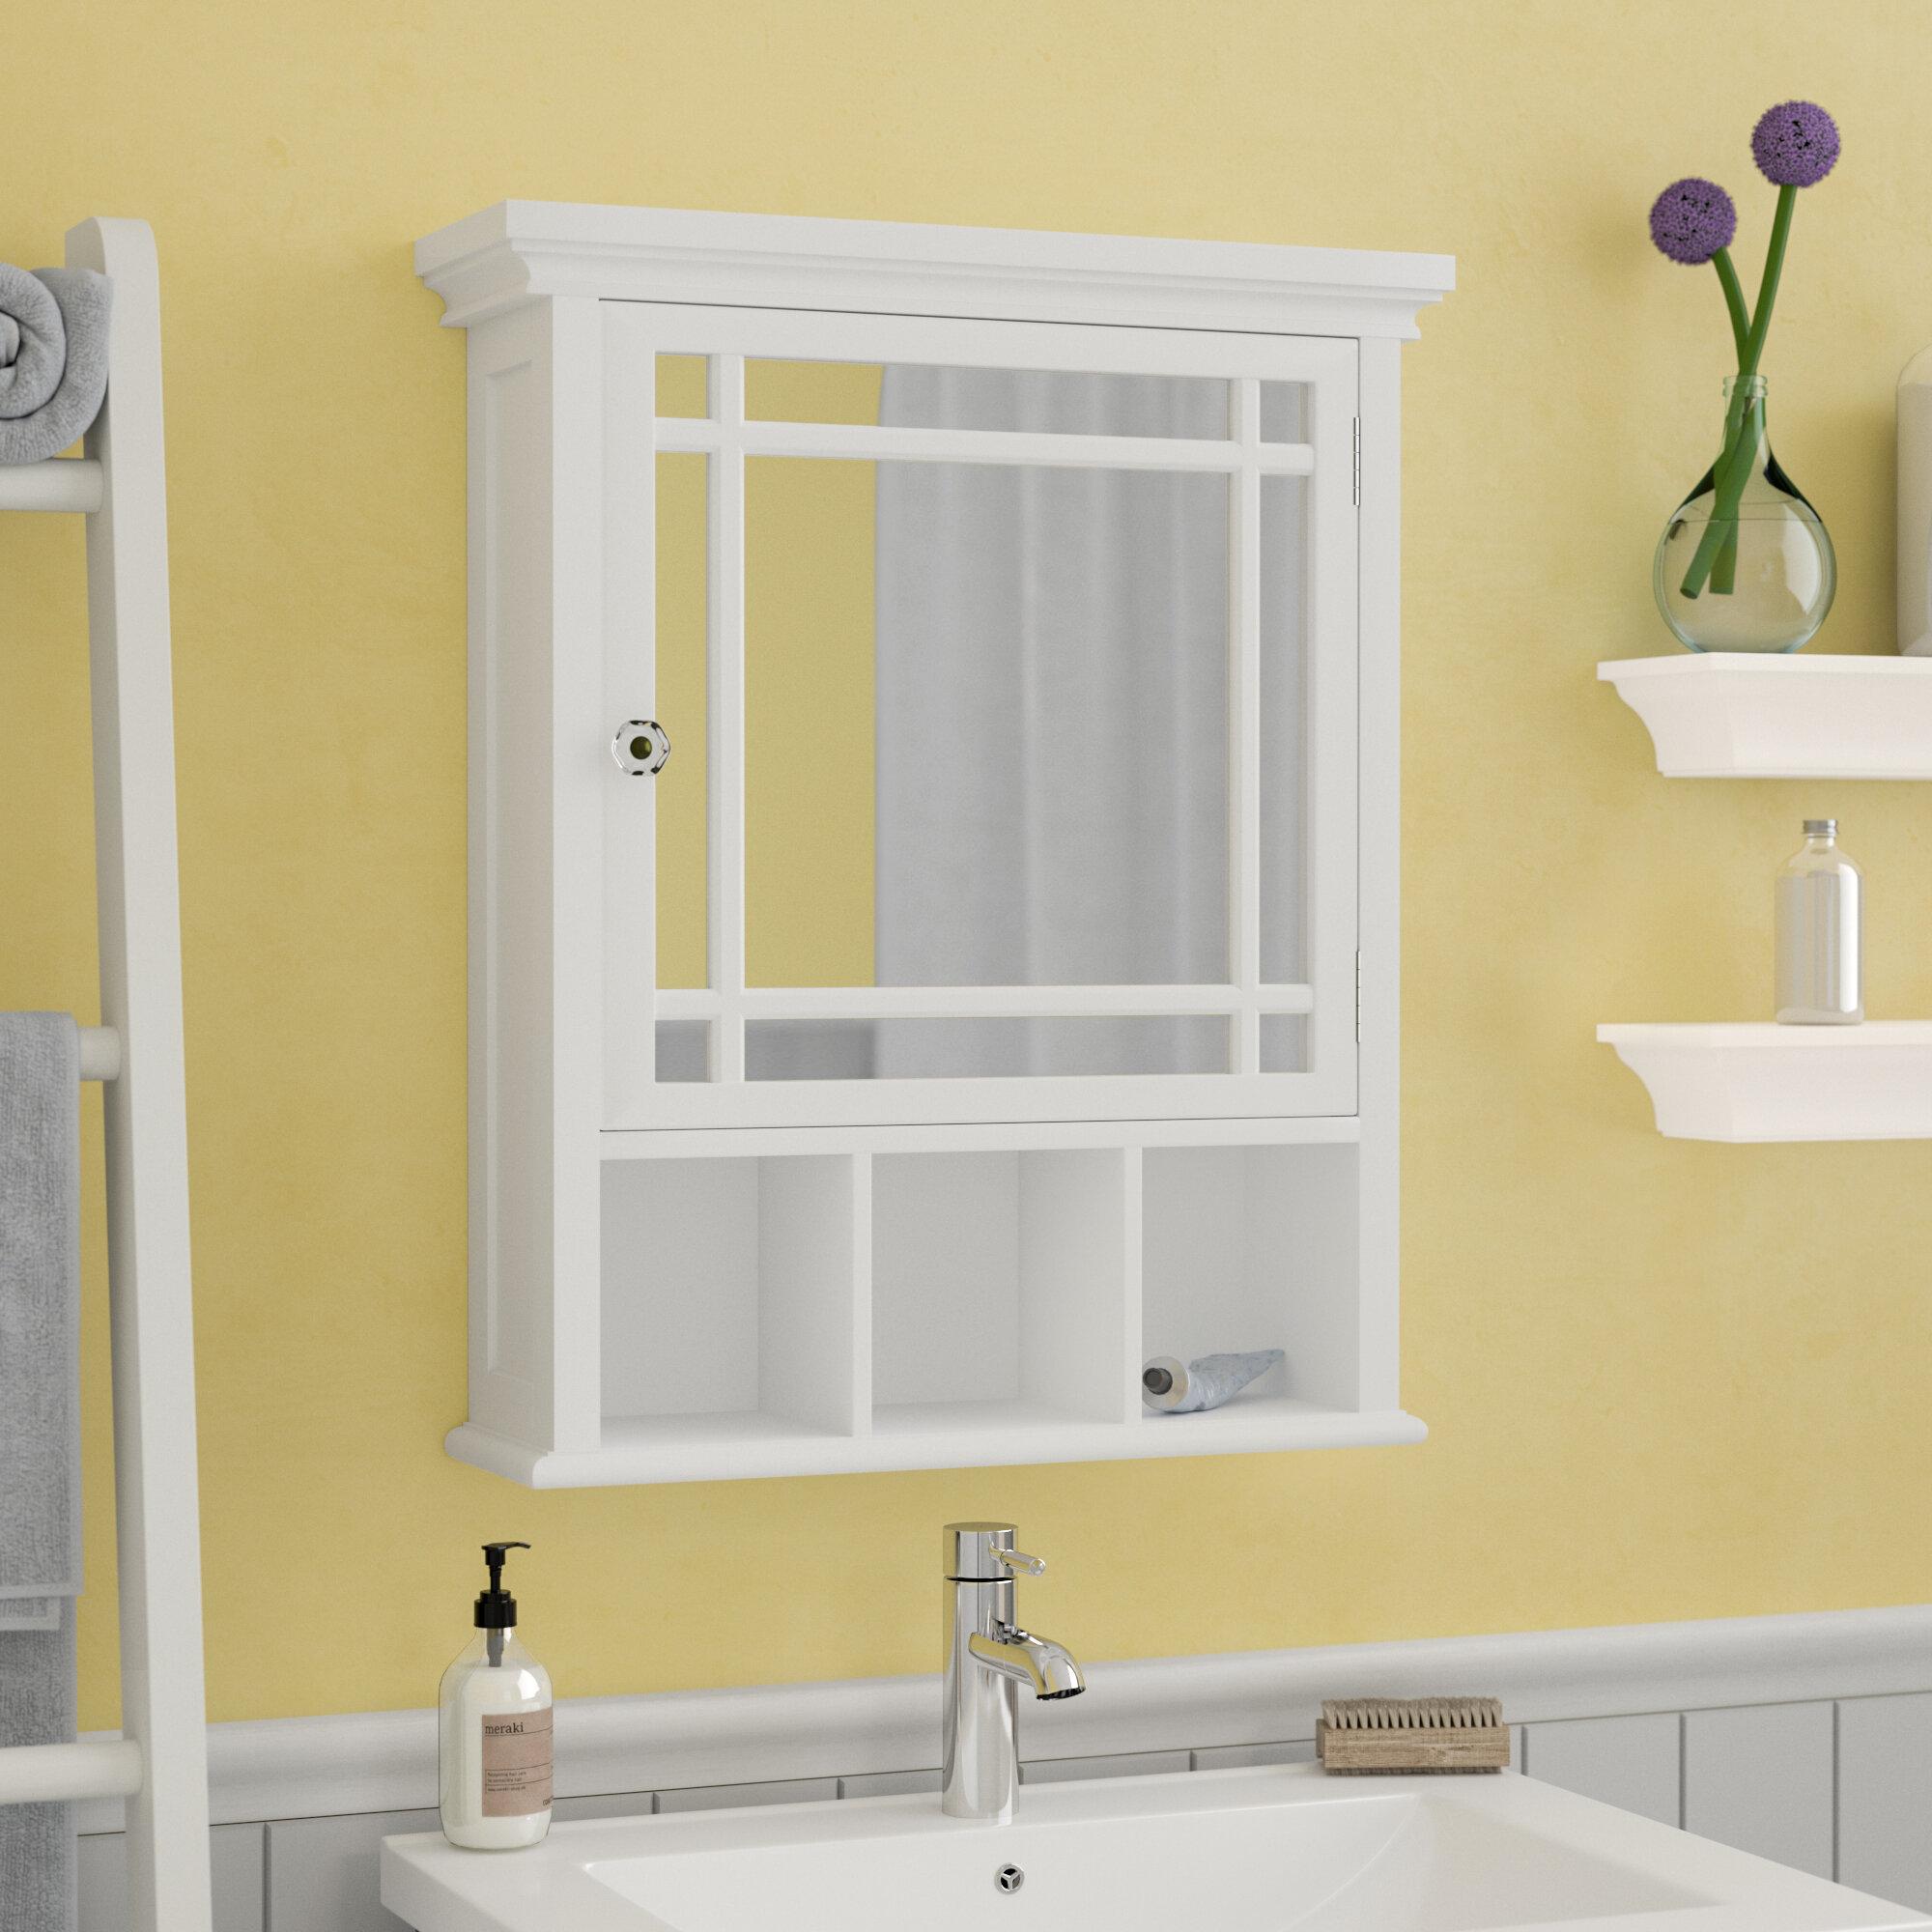 Surprising Taryn 20 X 24 Surface Mount Framed Medicine Cabinet With 1 Adjustable Shelf Download Free Architecture Designs Licukmadebymaigaardcom